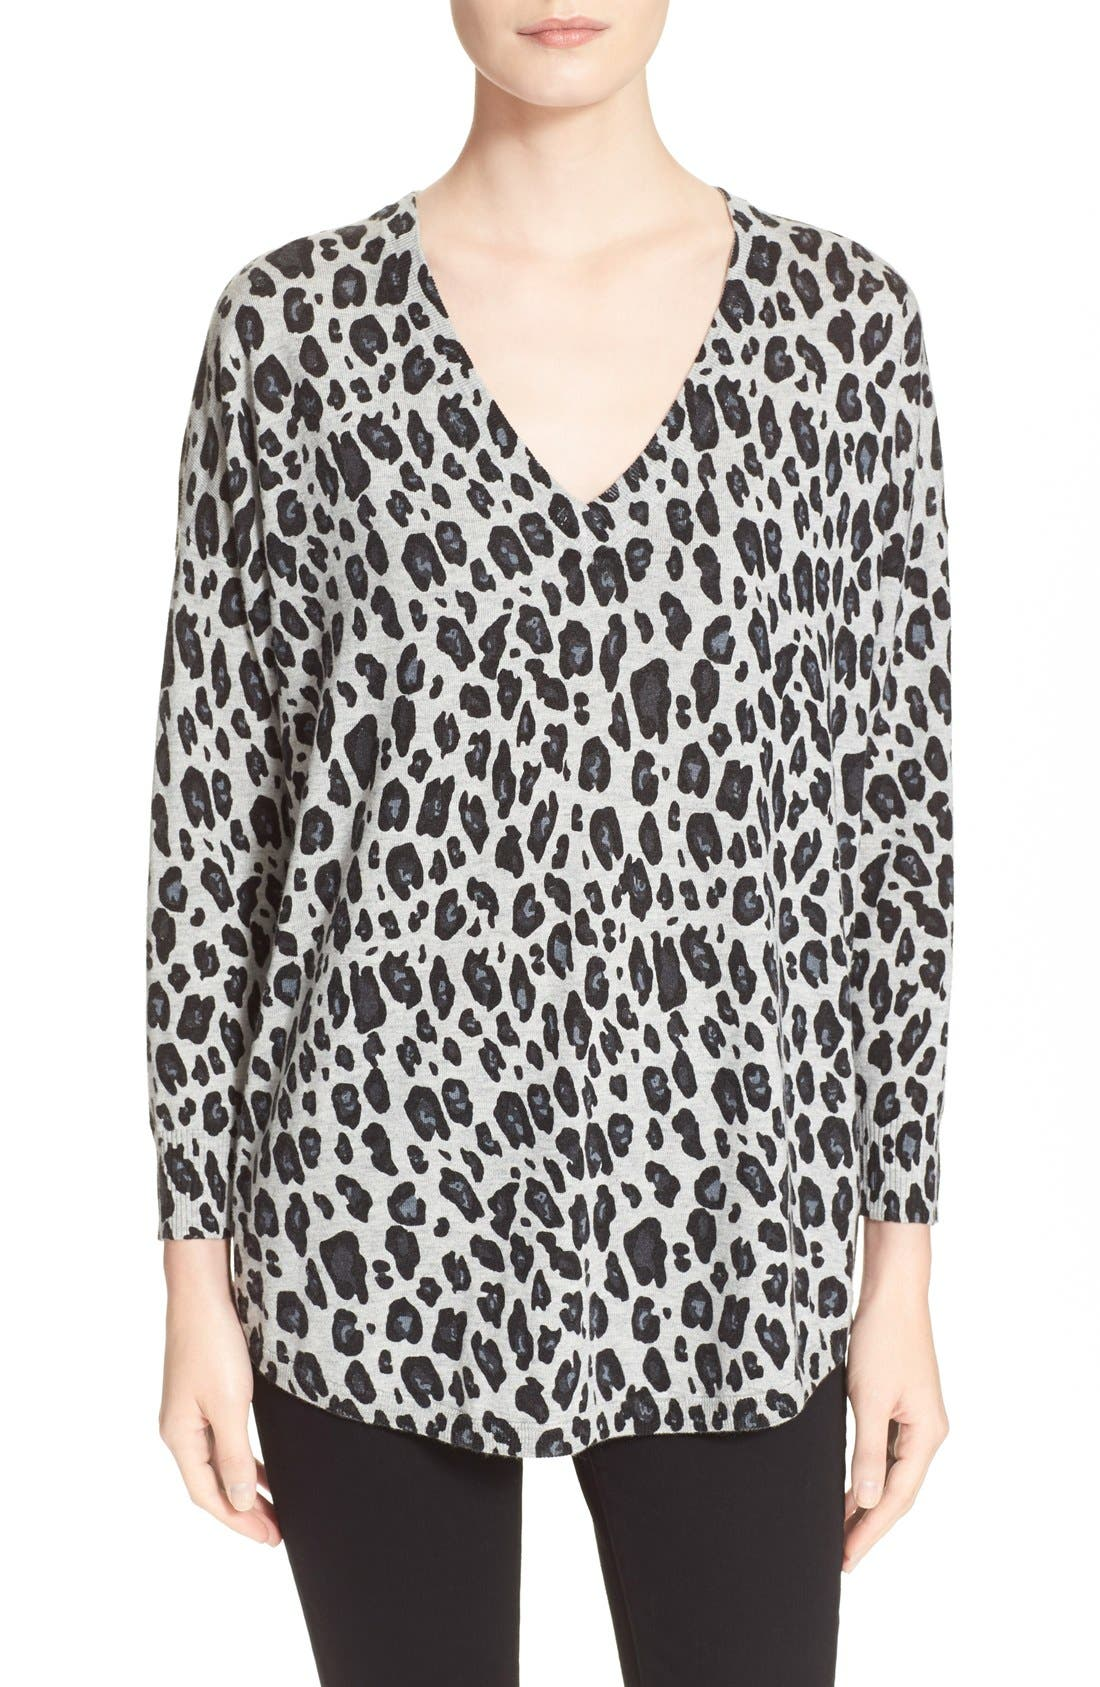 Main Image - Joie'Chyanne' Leopard Print V-Neck Pullover